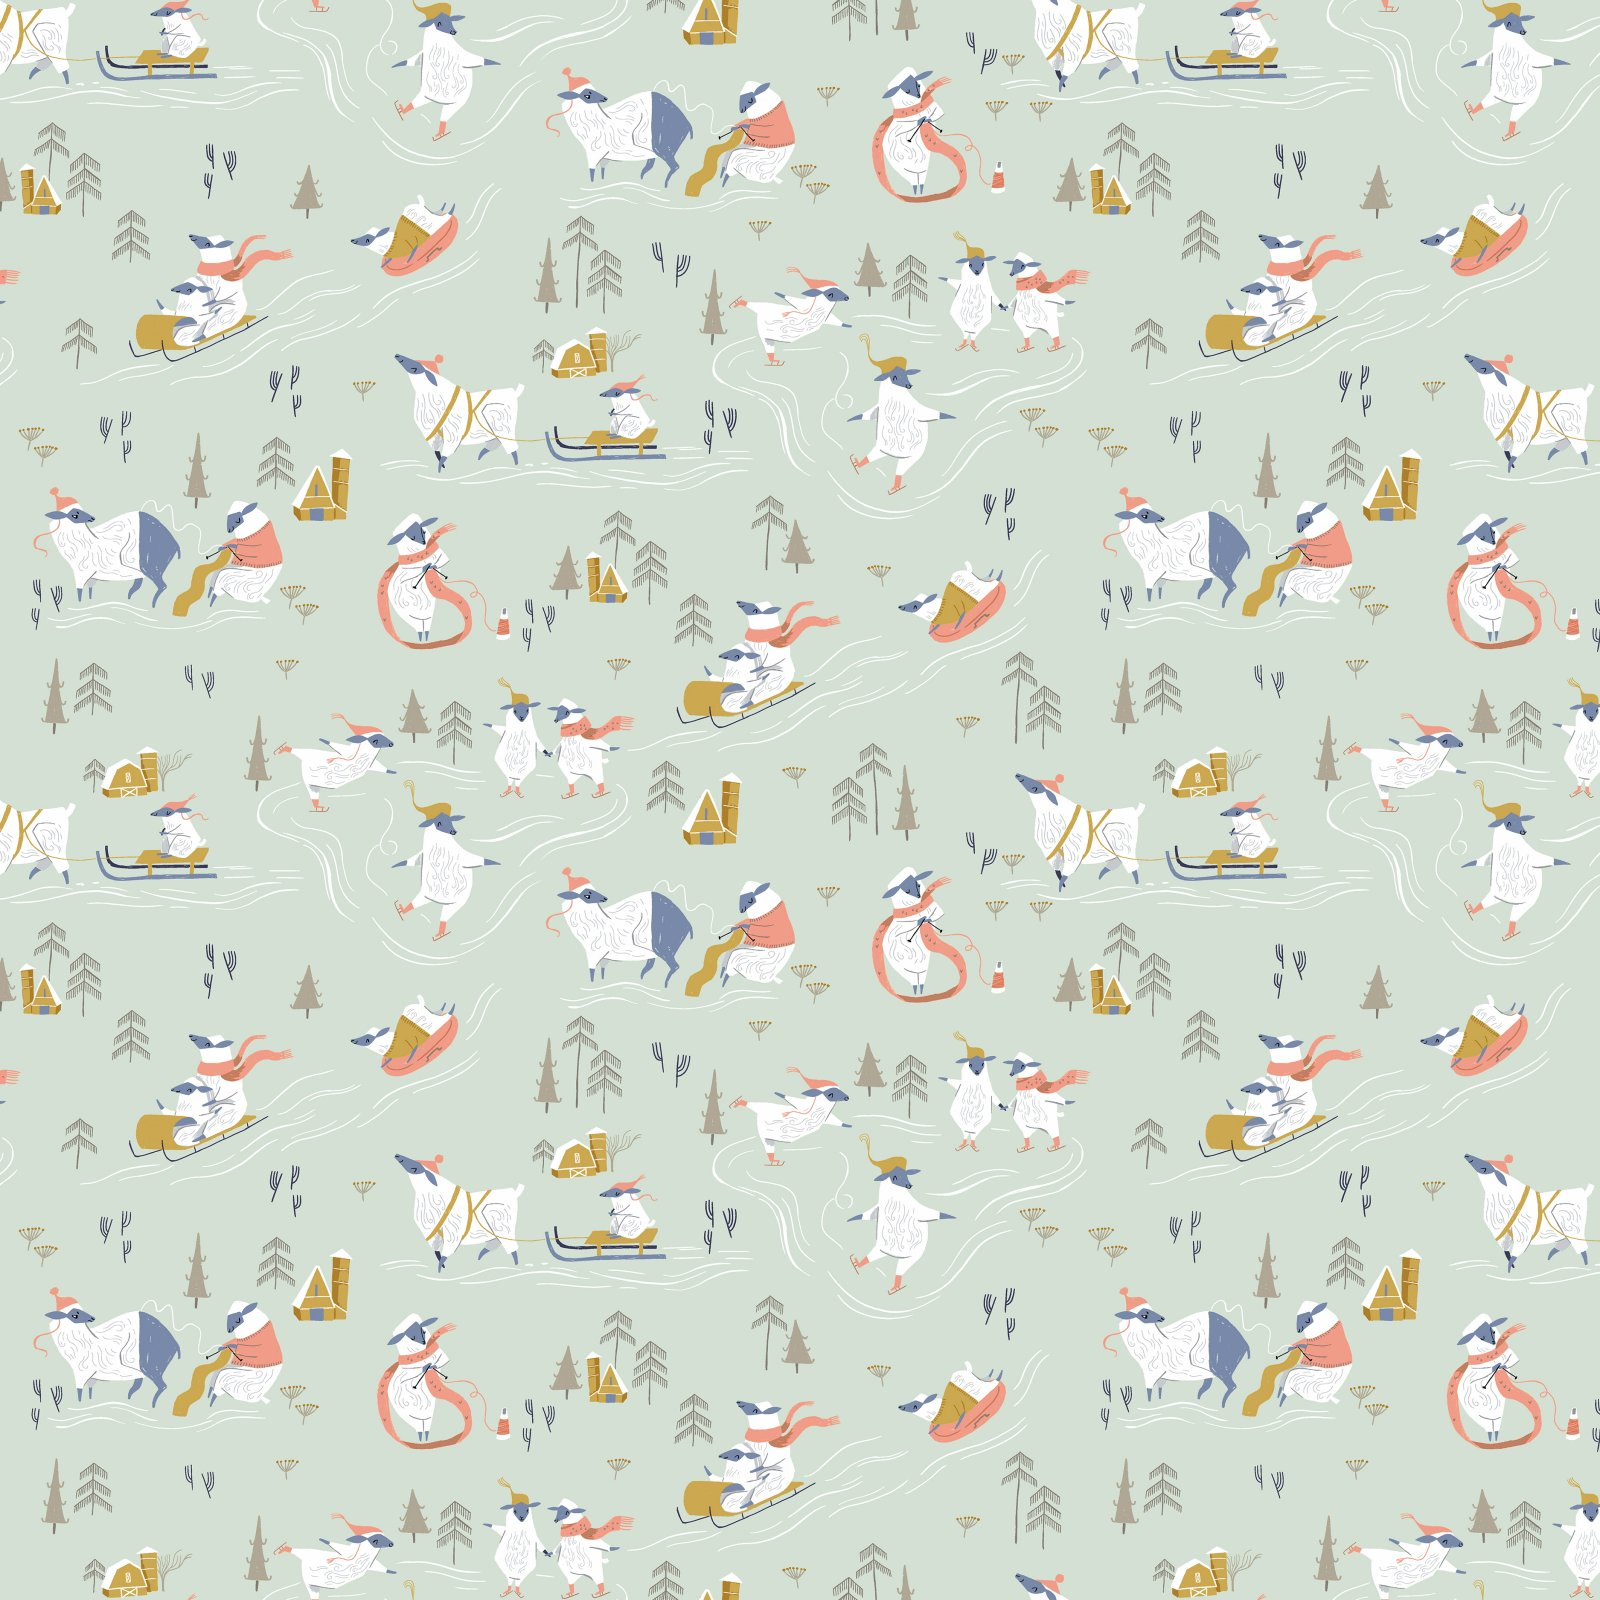 Rae Ritchie Sheepish - Snow Day (Misty)